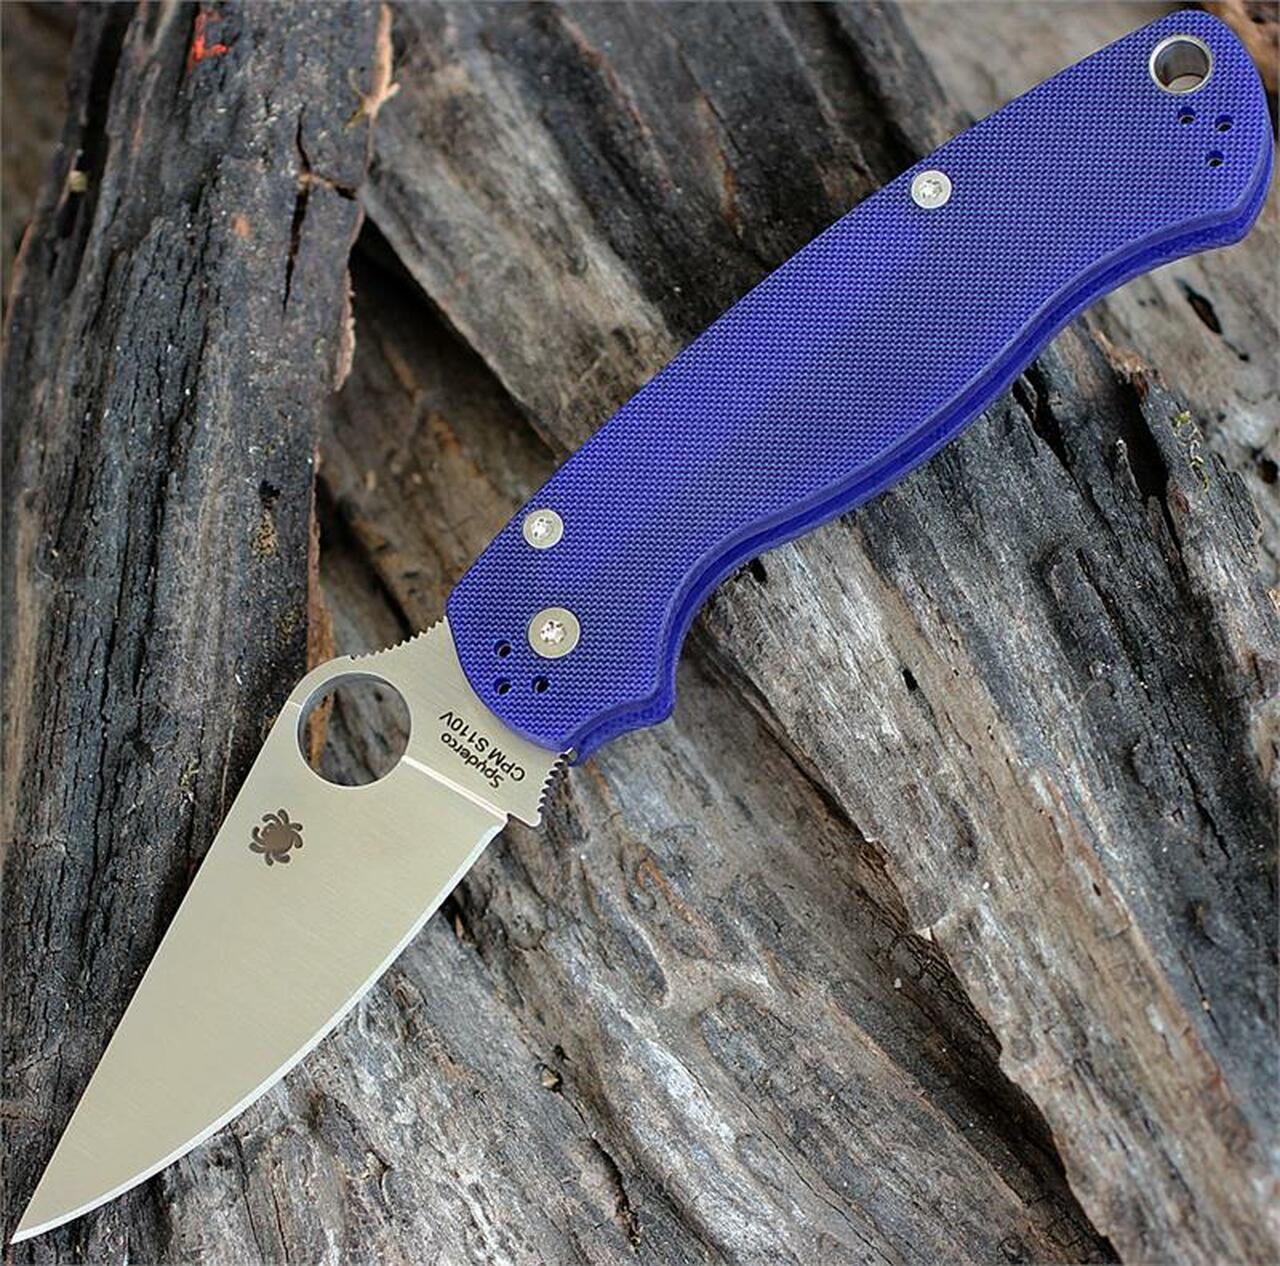 Нож Spyderco Para-Military 2 G-10 Dark Blue CPM S110V